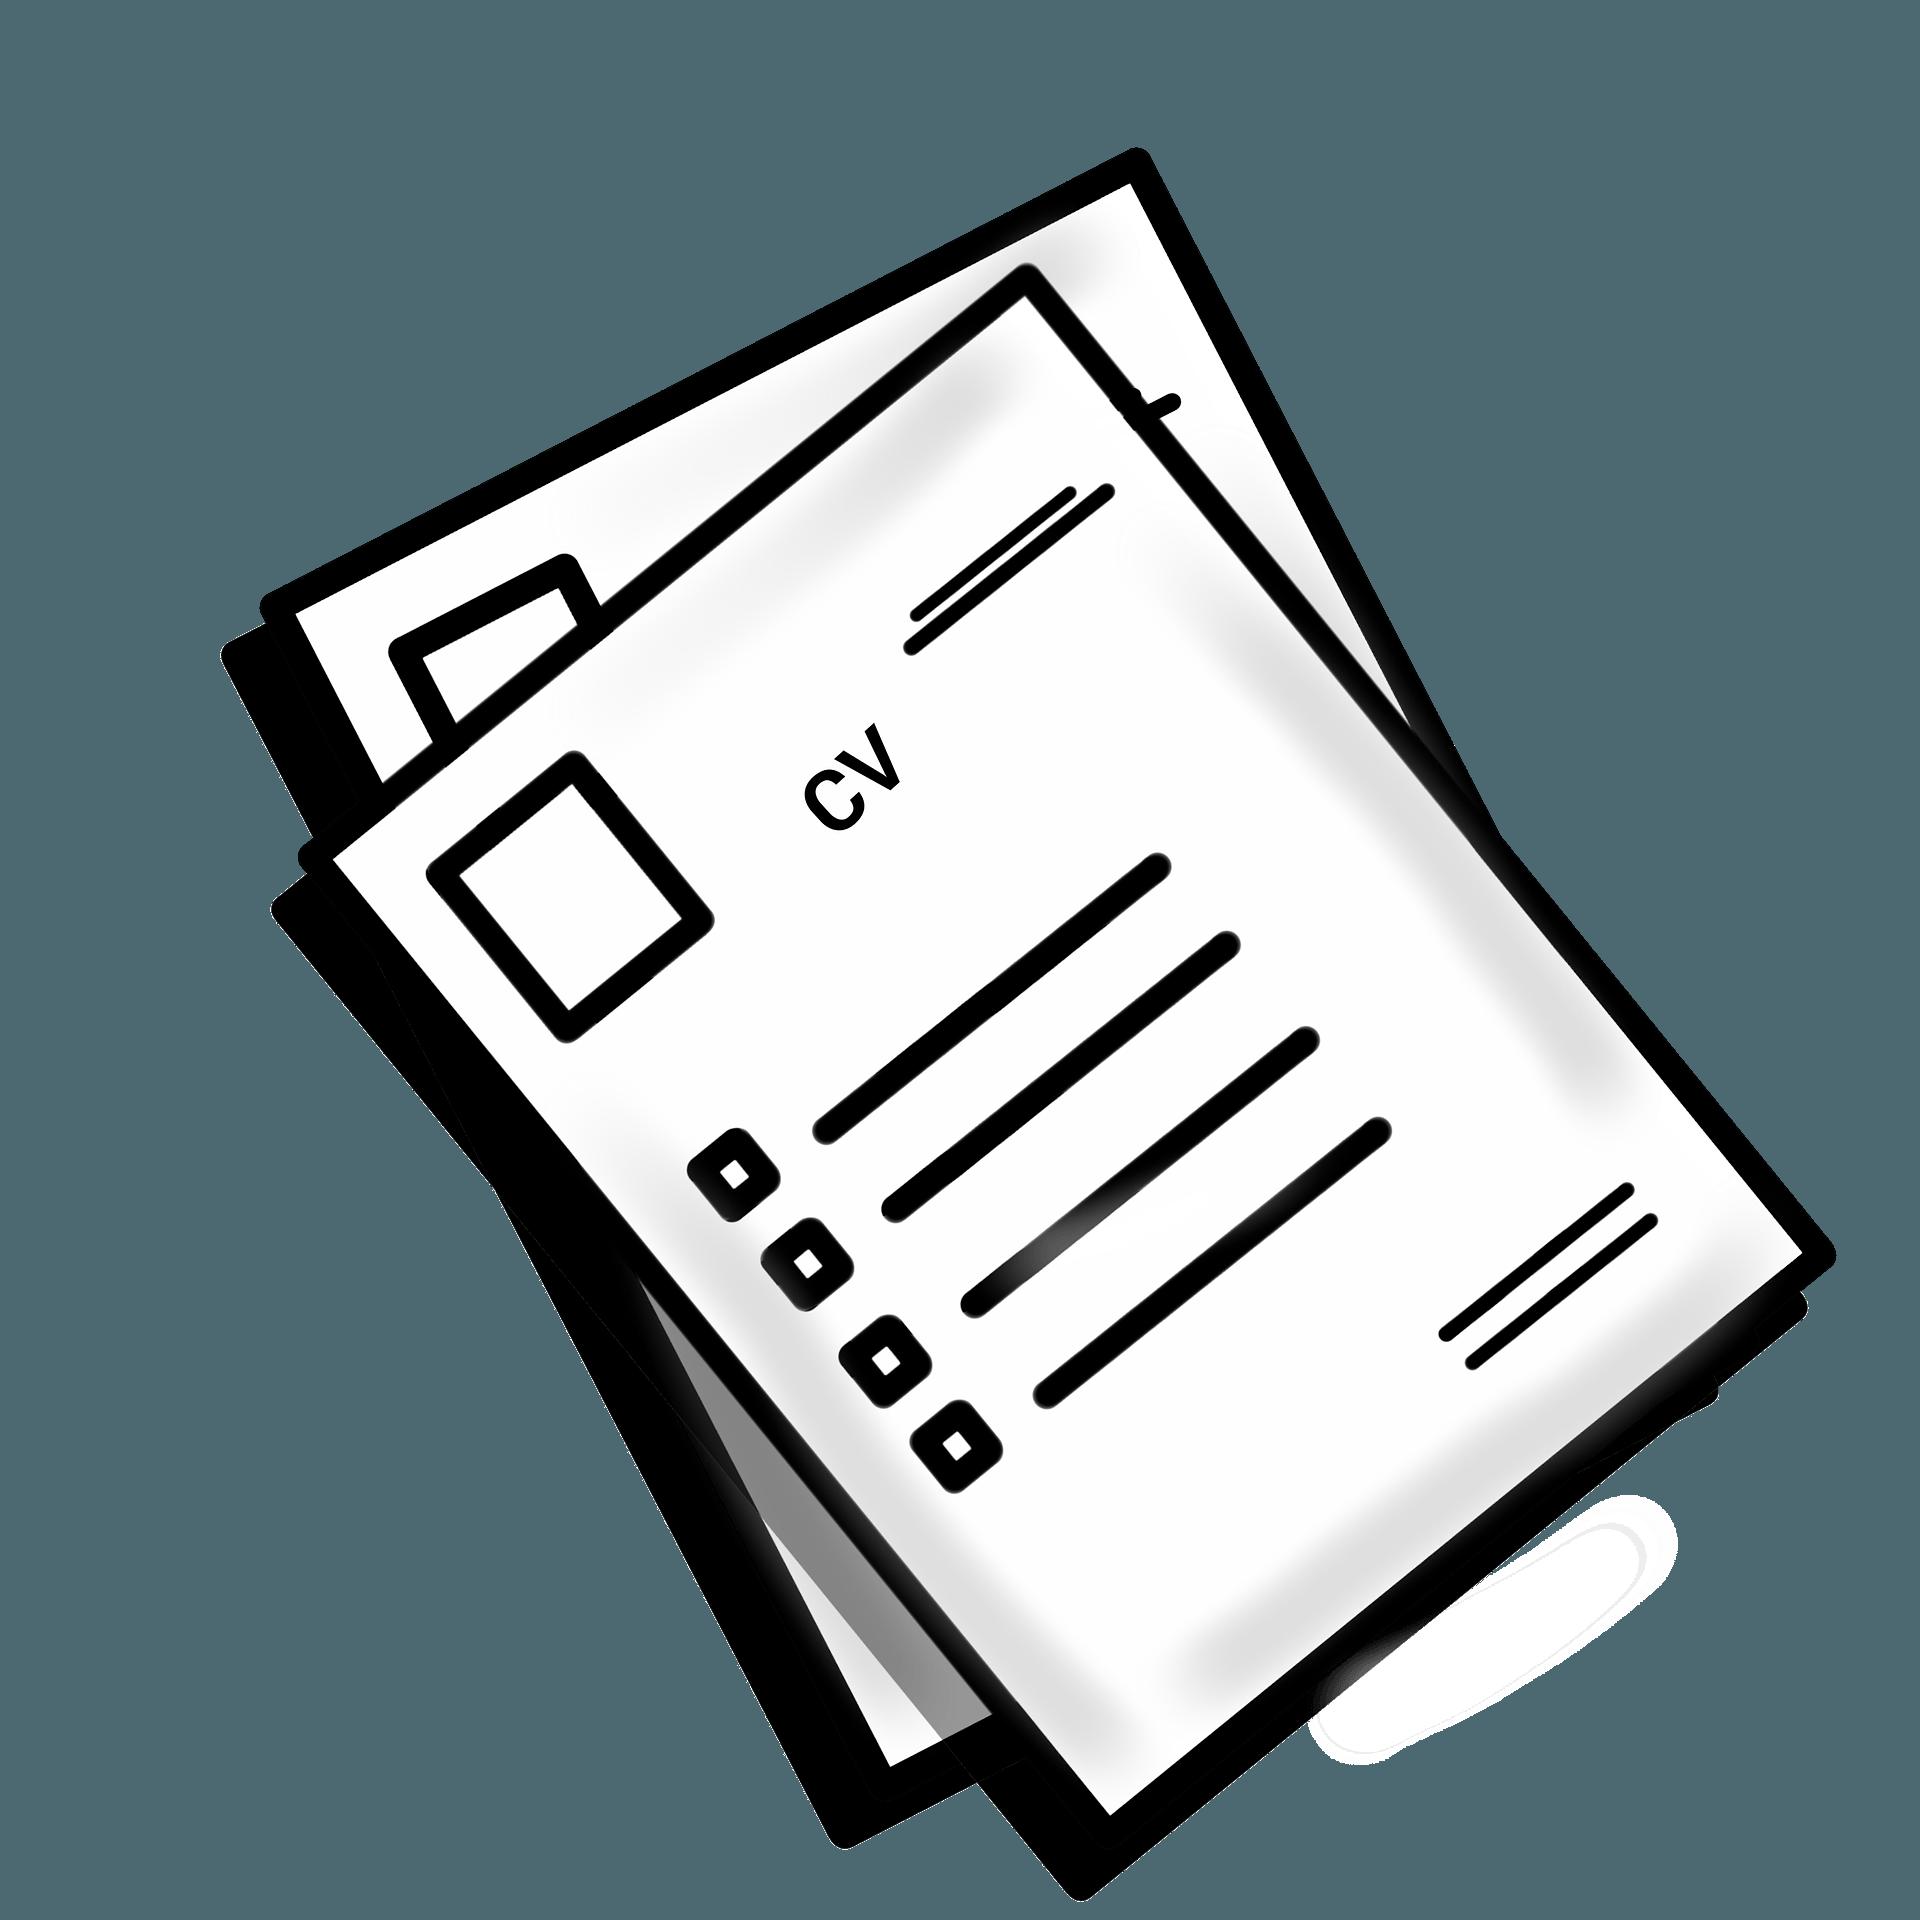 resume-2296951_1920